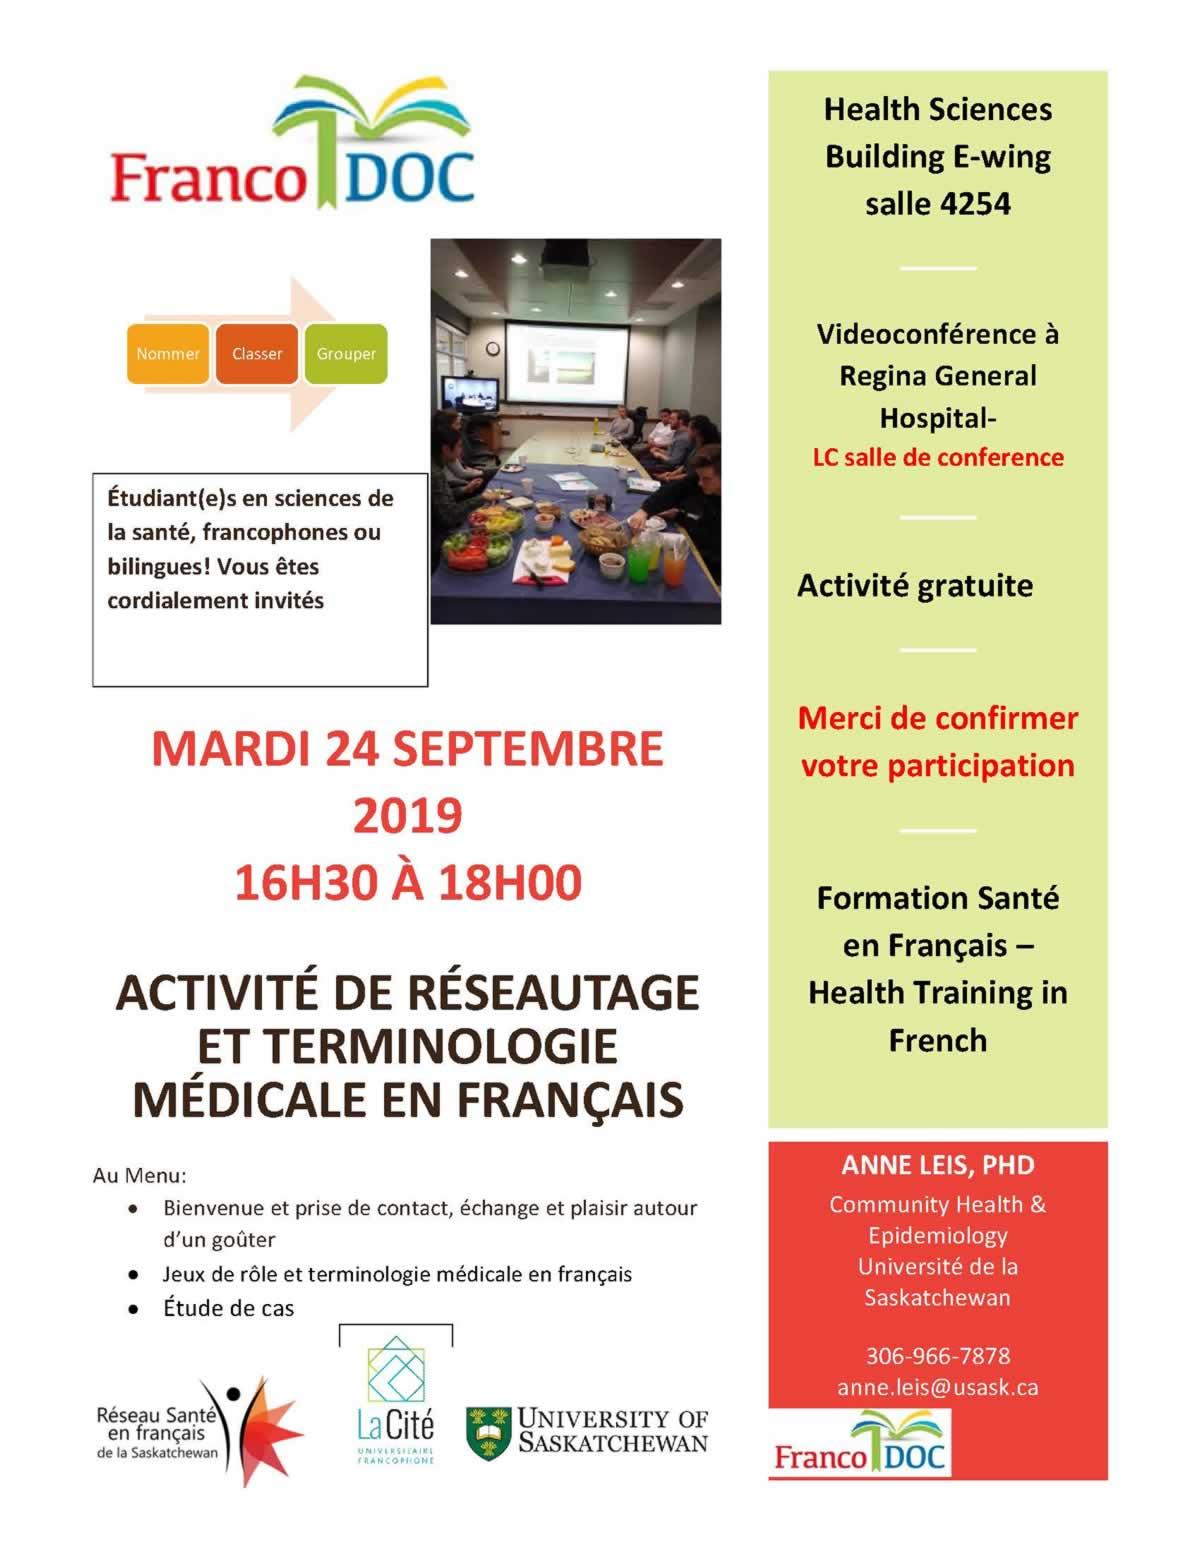 Rencontre FrancoDOC - 24 septembre 2019